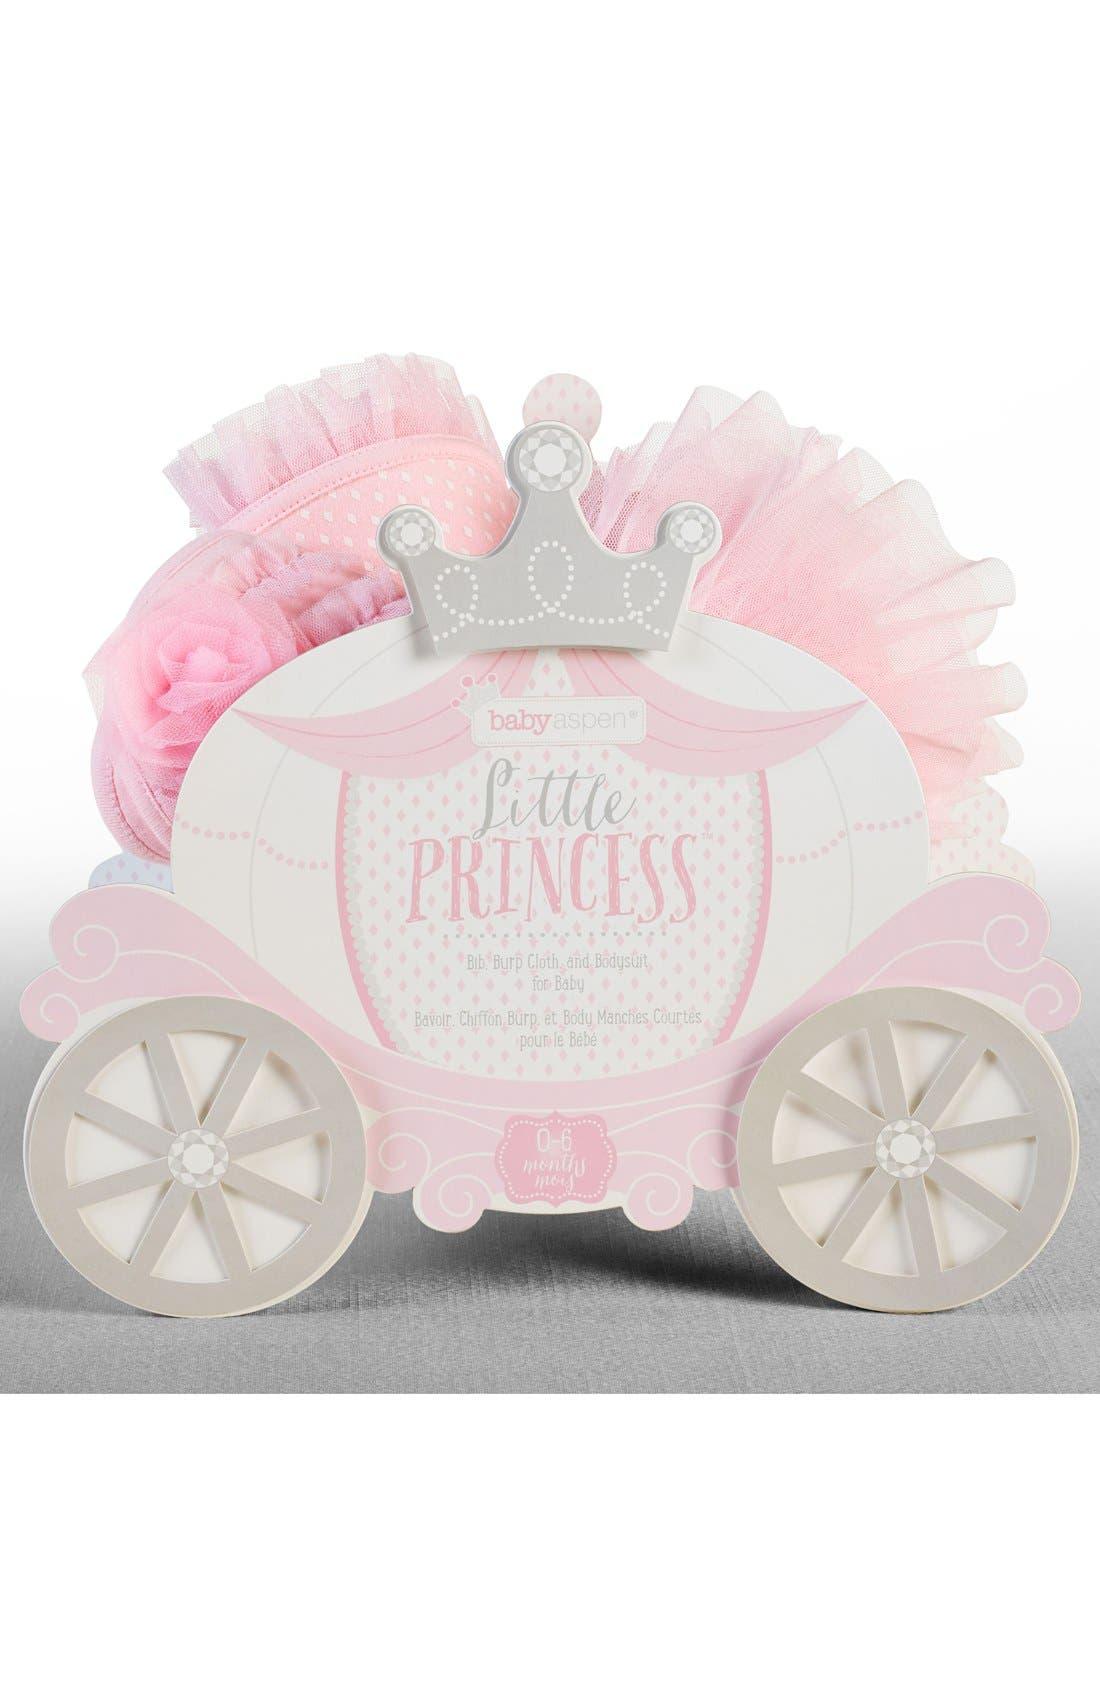 Little Princess 3-Piece Gift Set,                             Alternate thumbnail 2, color,                             Pink